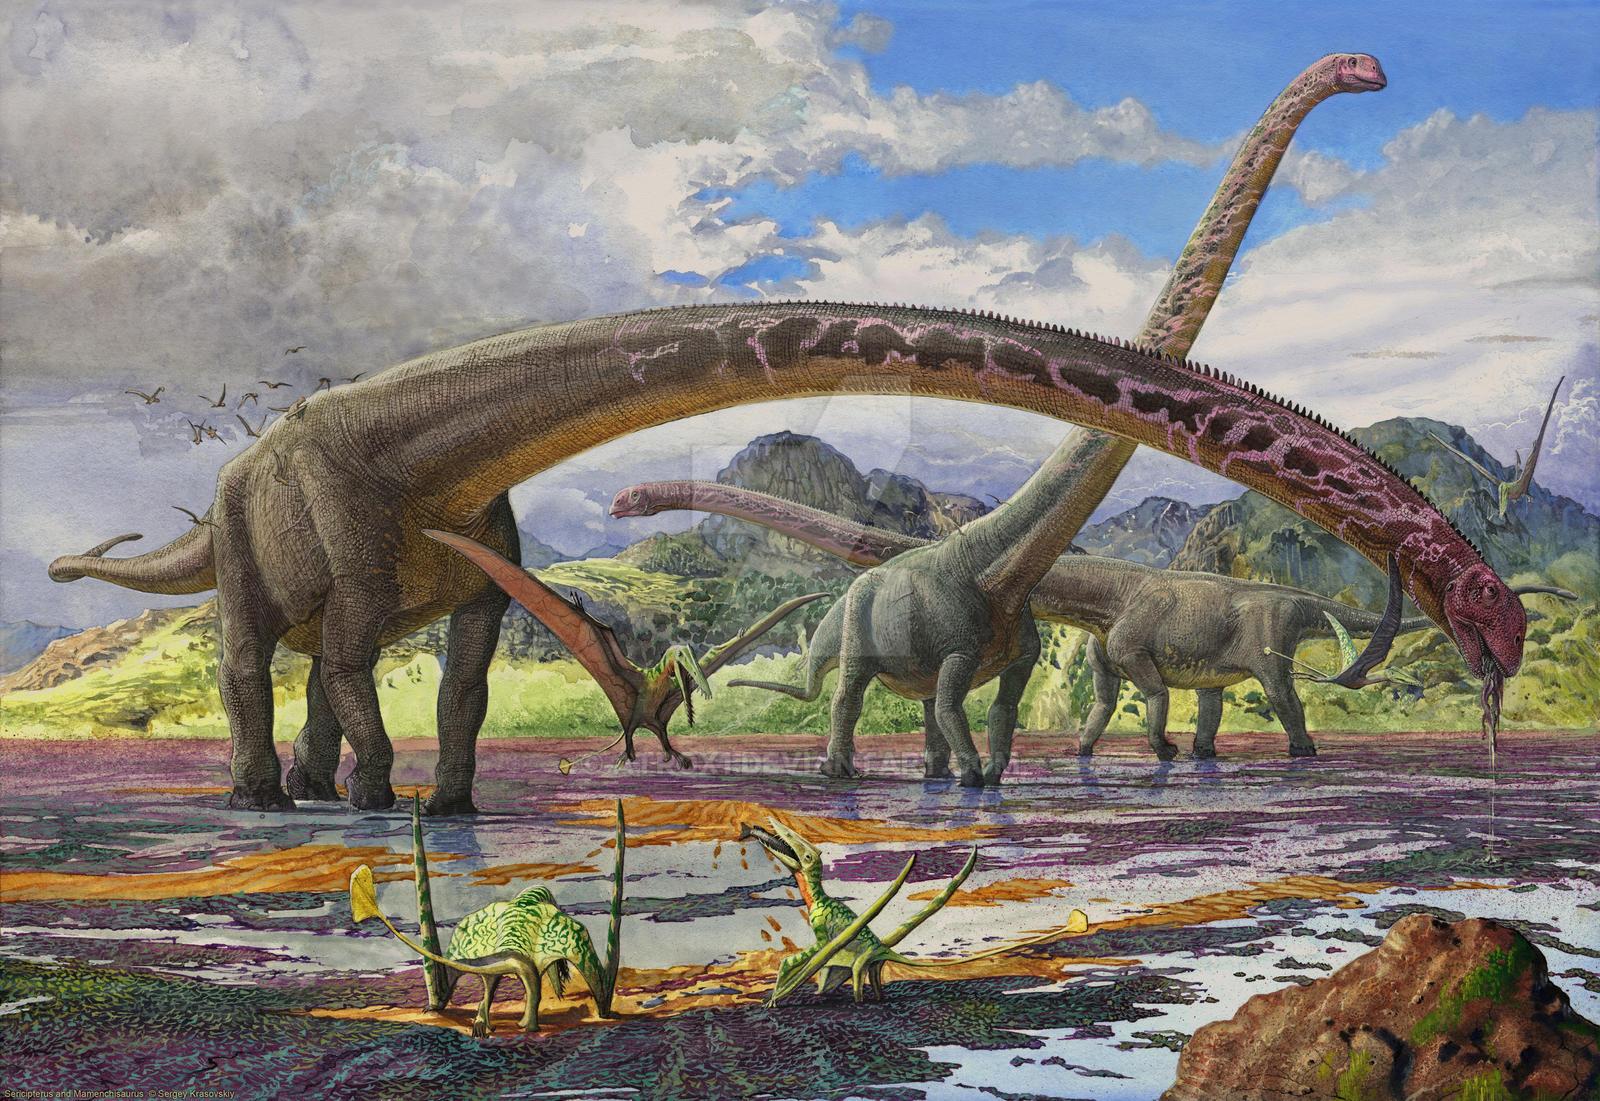 Mamenchisaurus by atrox1